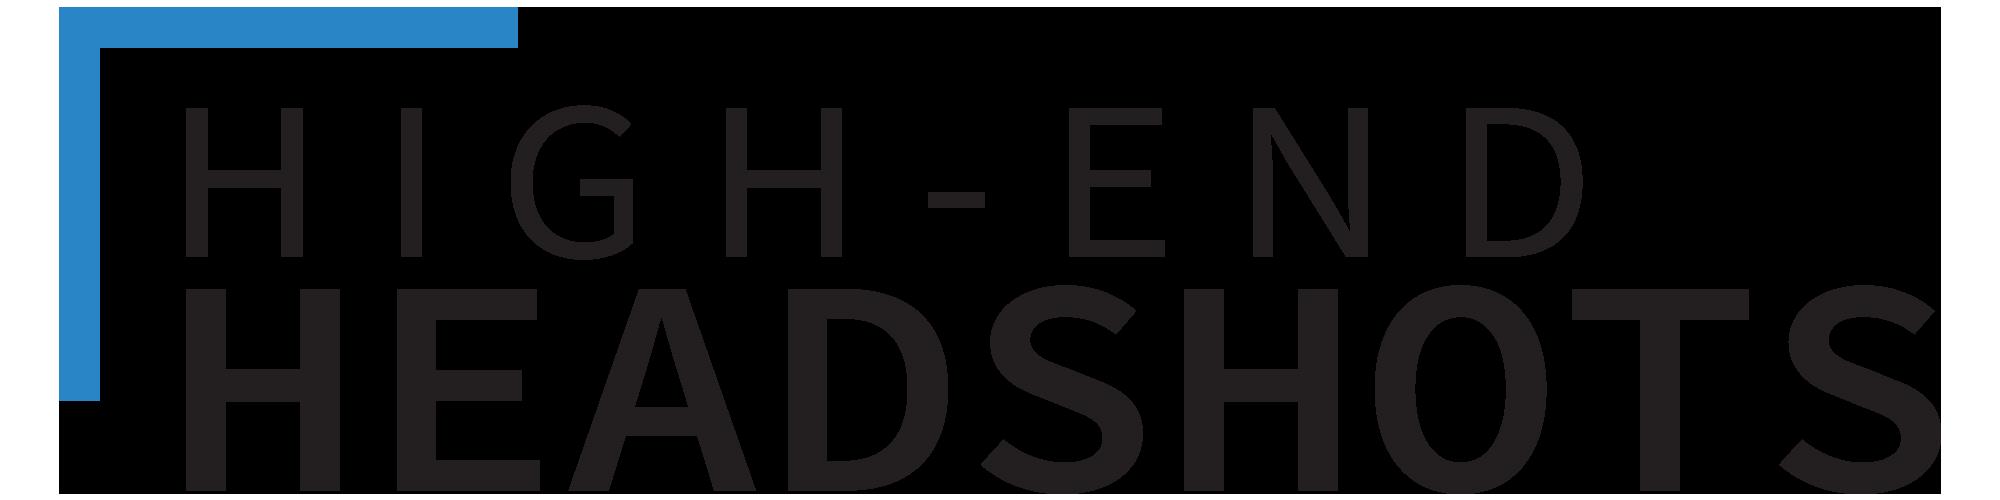 High-End Headshots